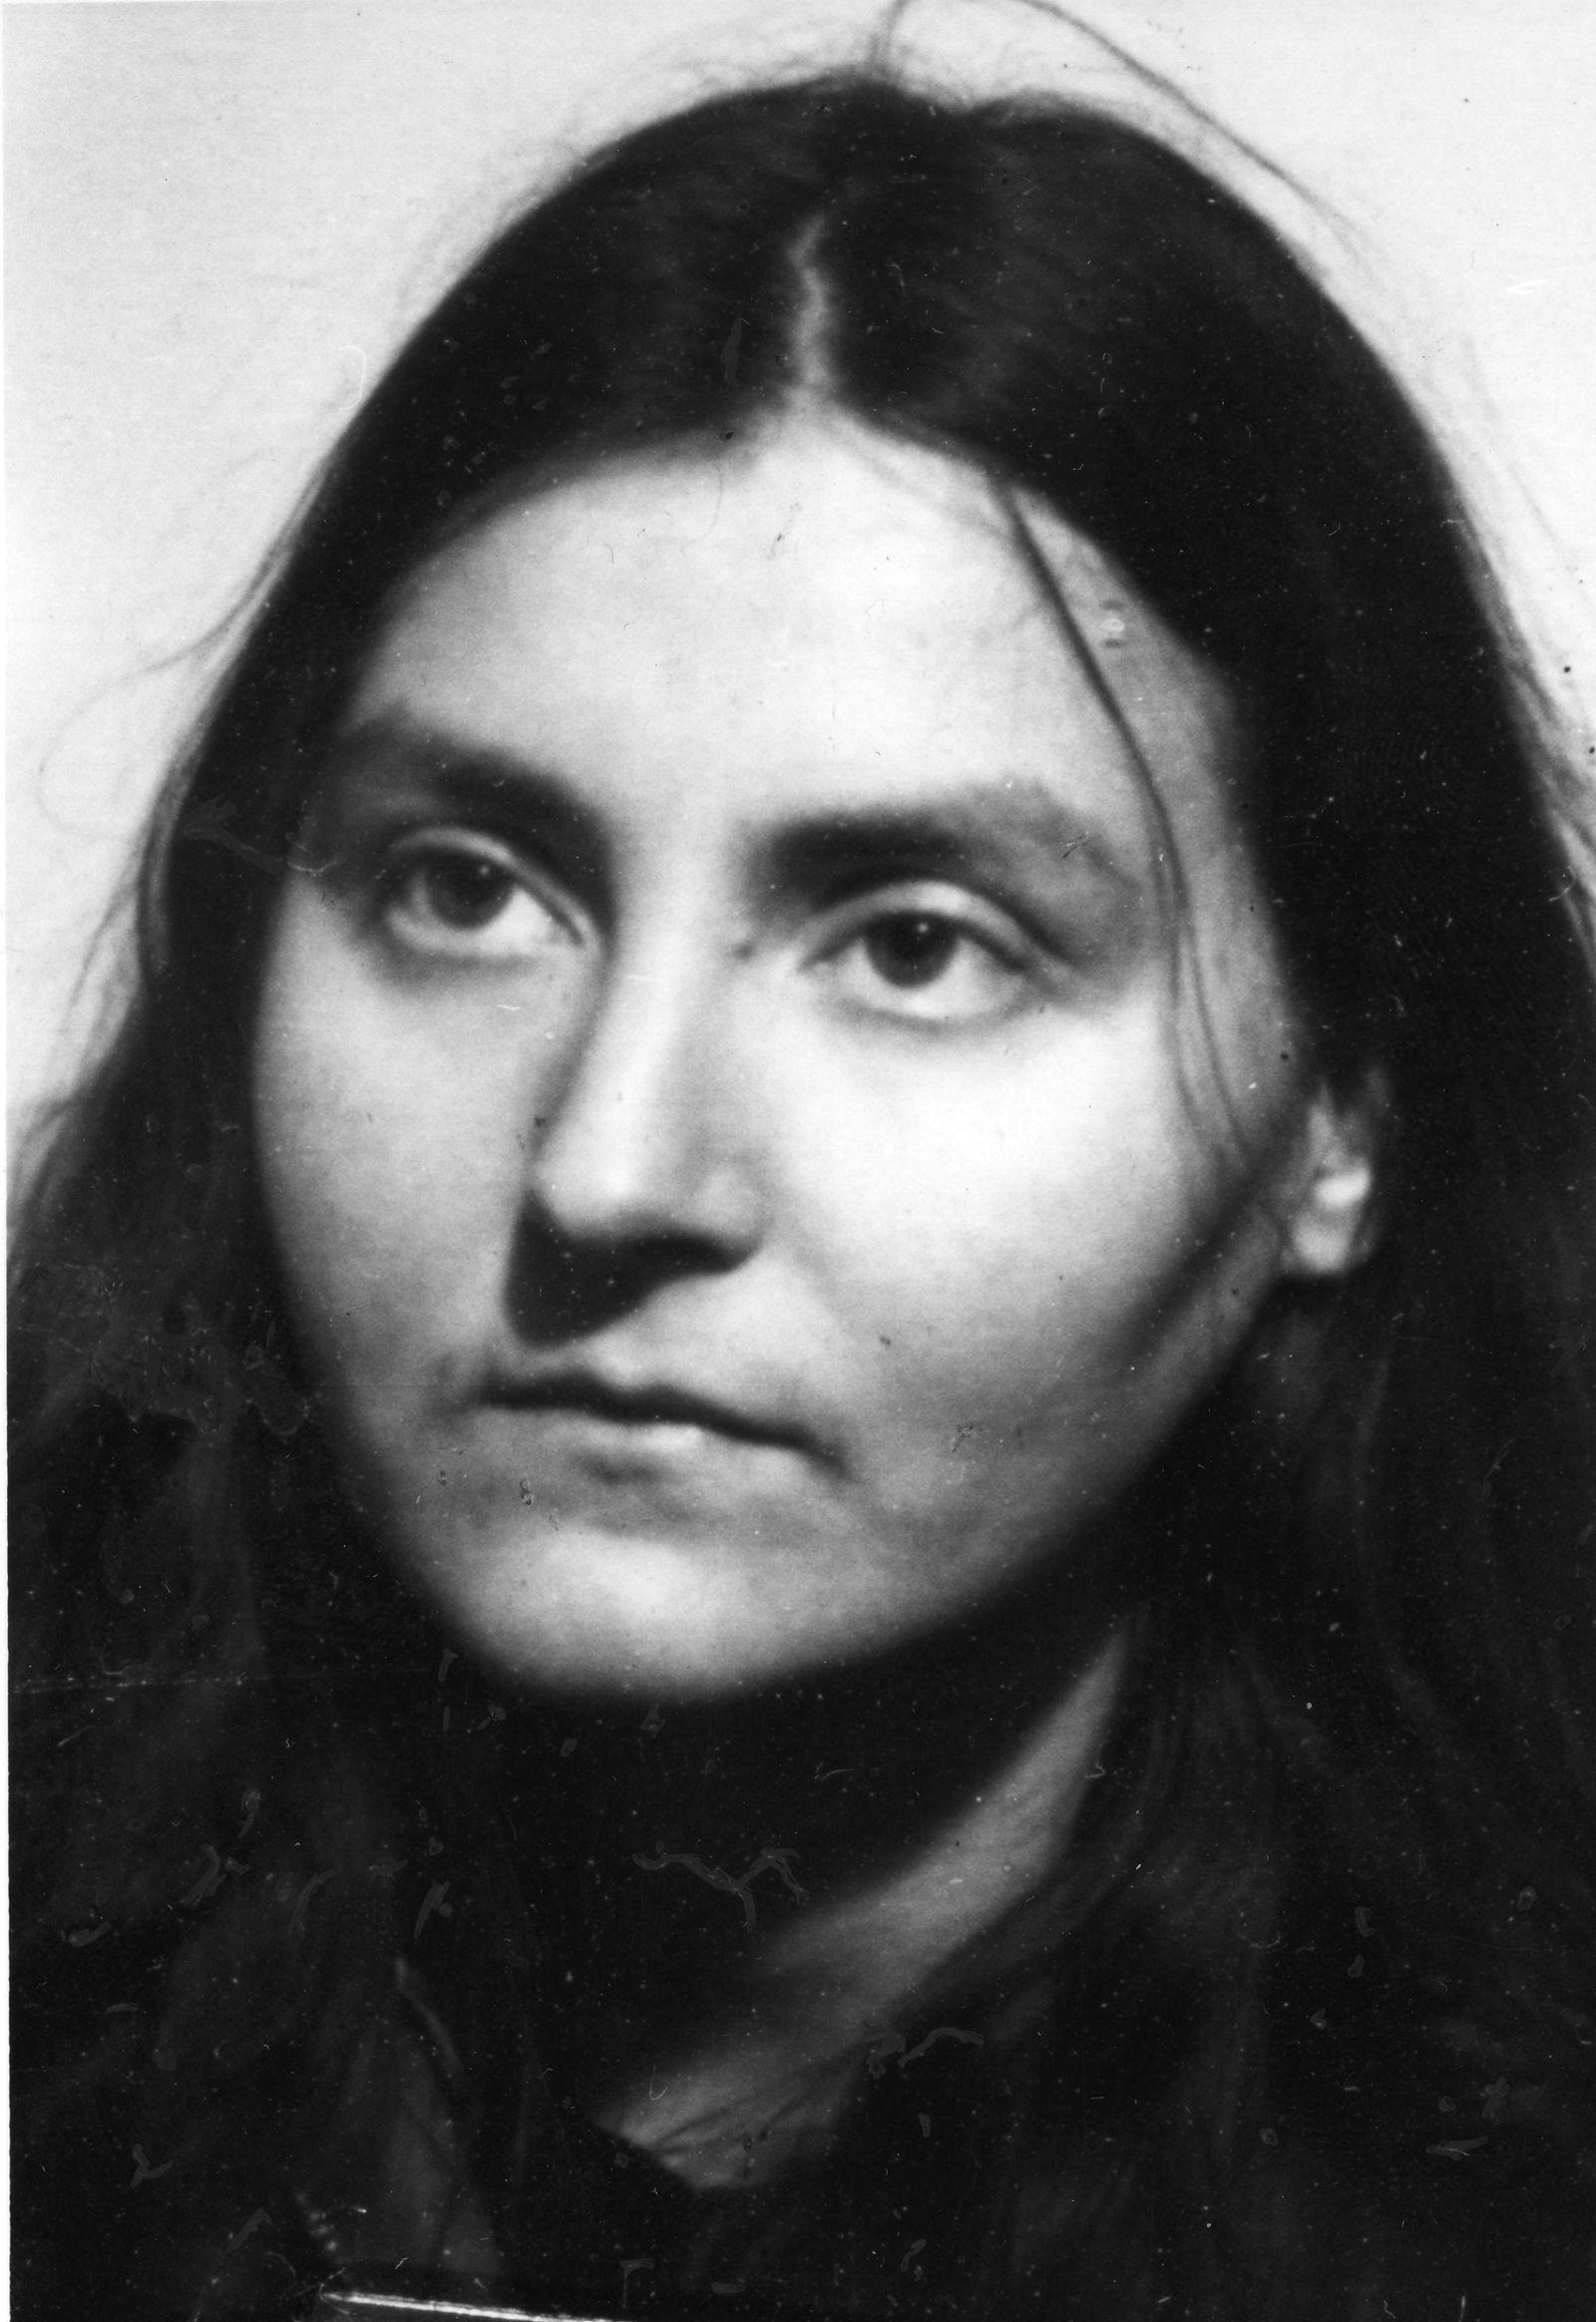 Christa Eckes